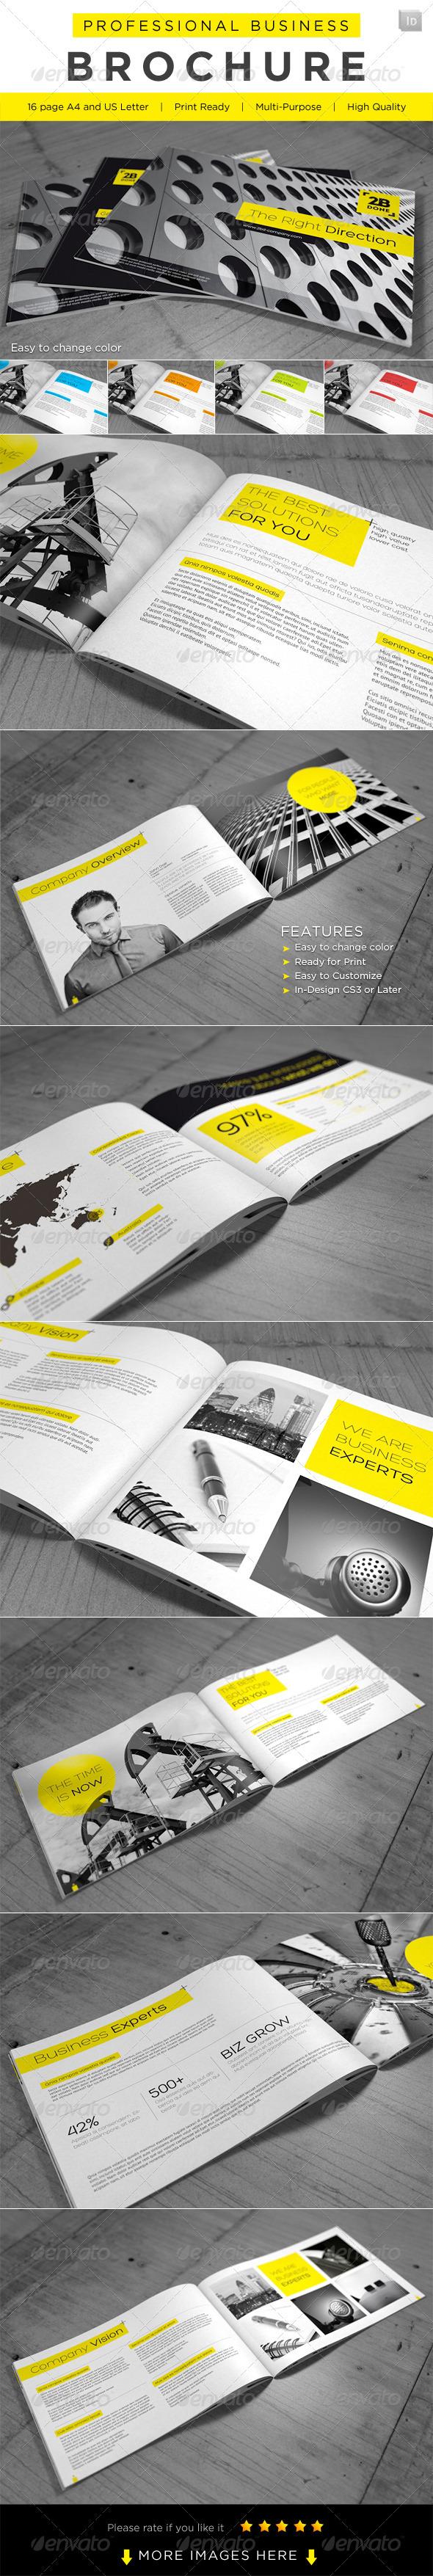 Professional Business Brochure - Brochures Print Templates